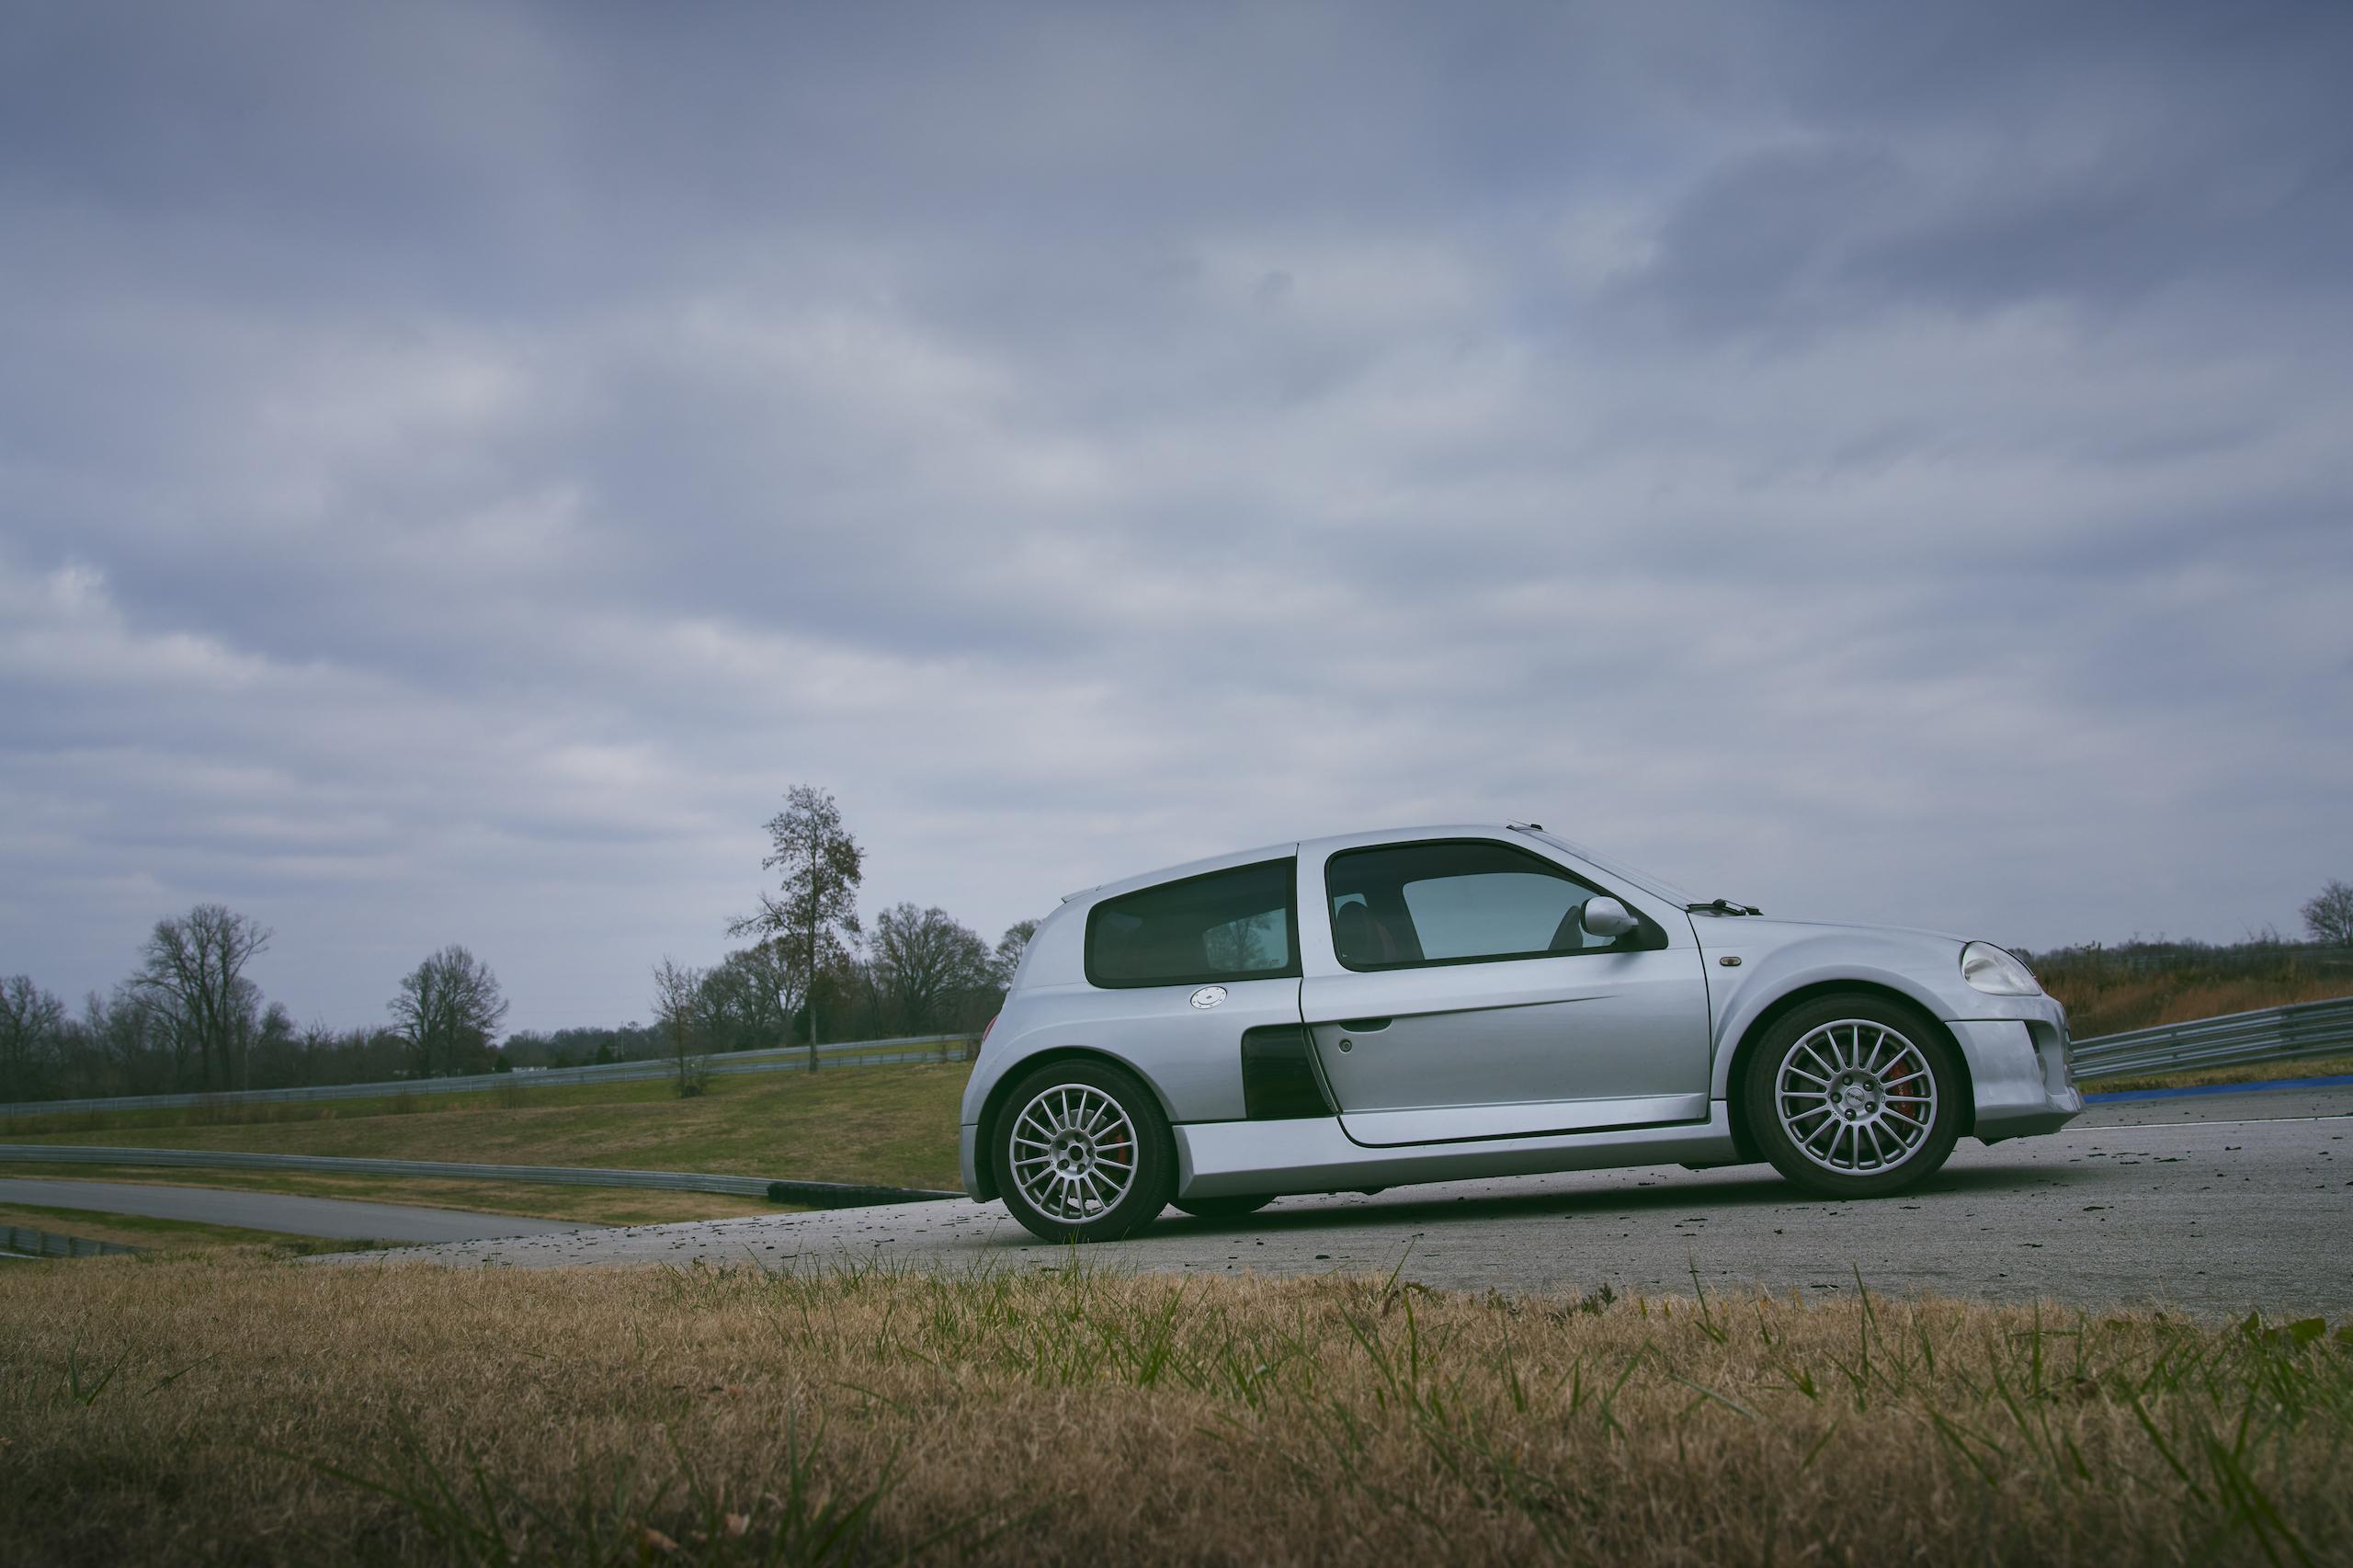 2002 Renault Clio V6 side profile